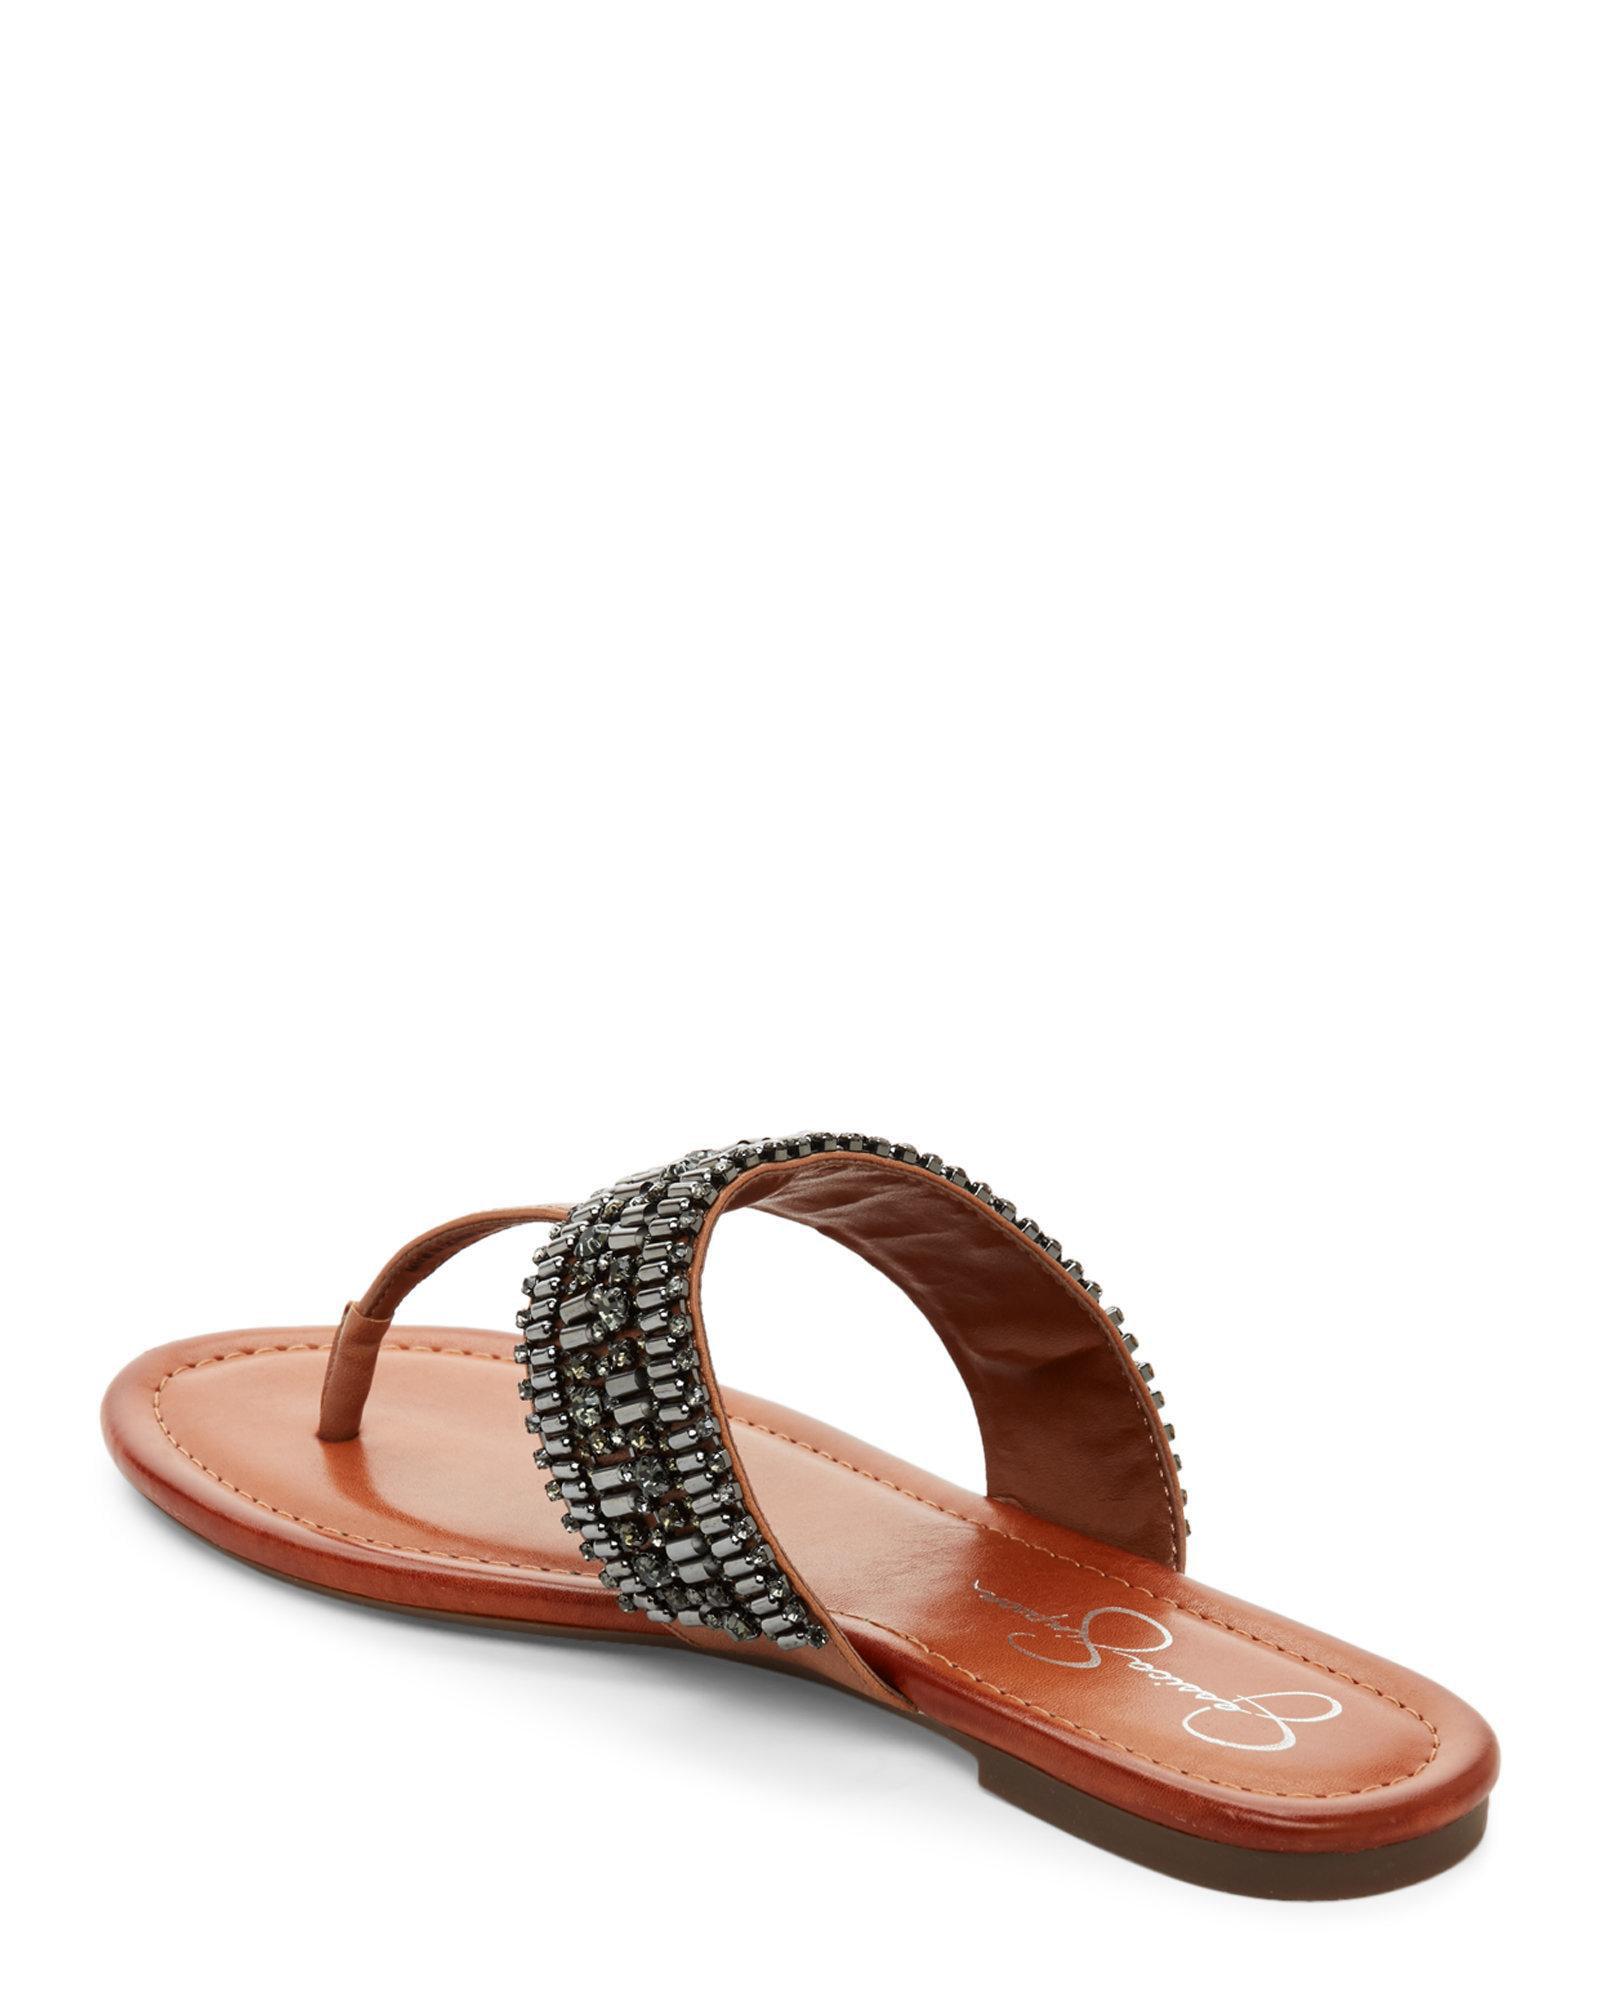 f38a4ad2f247 Jessica Simpson Womens Rollison Open Toe Beach Slide Sandals